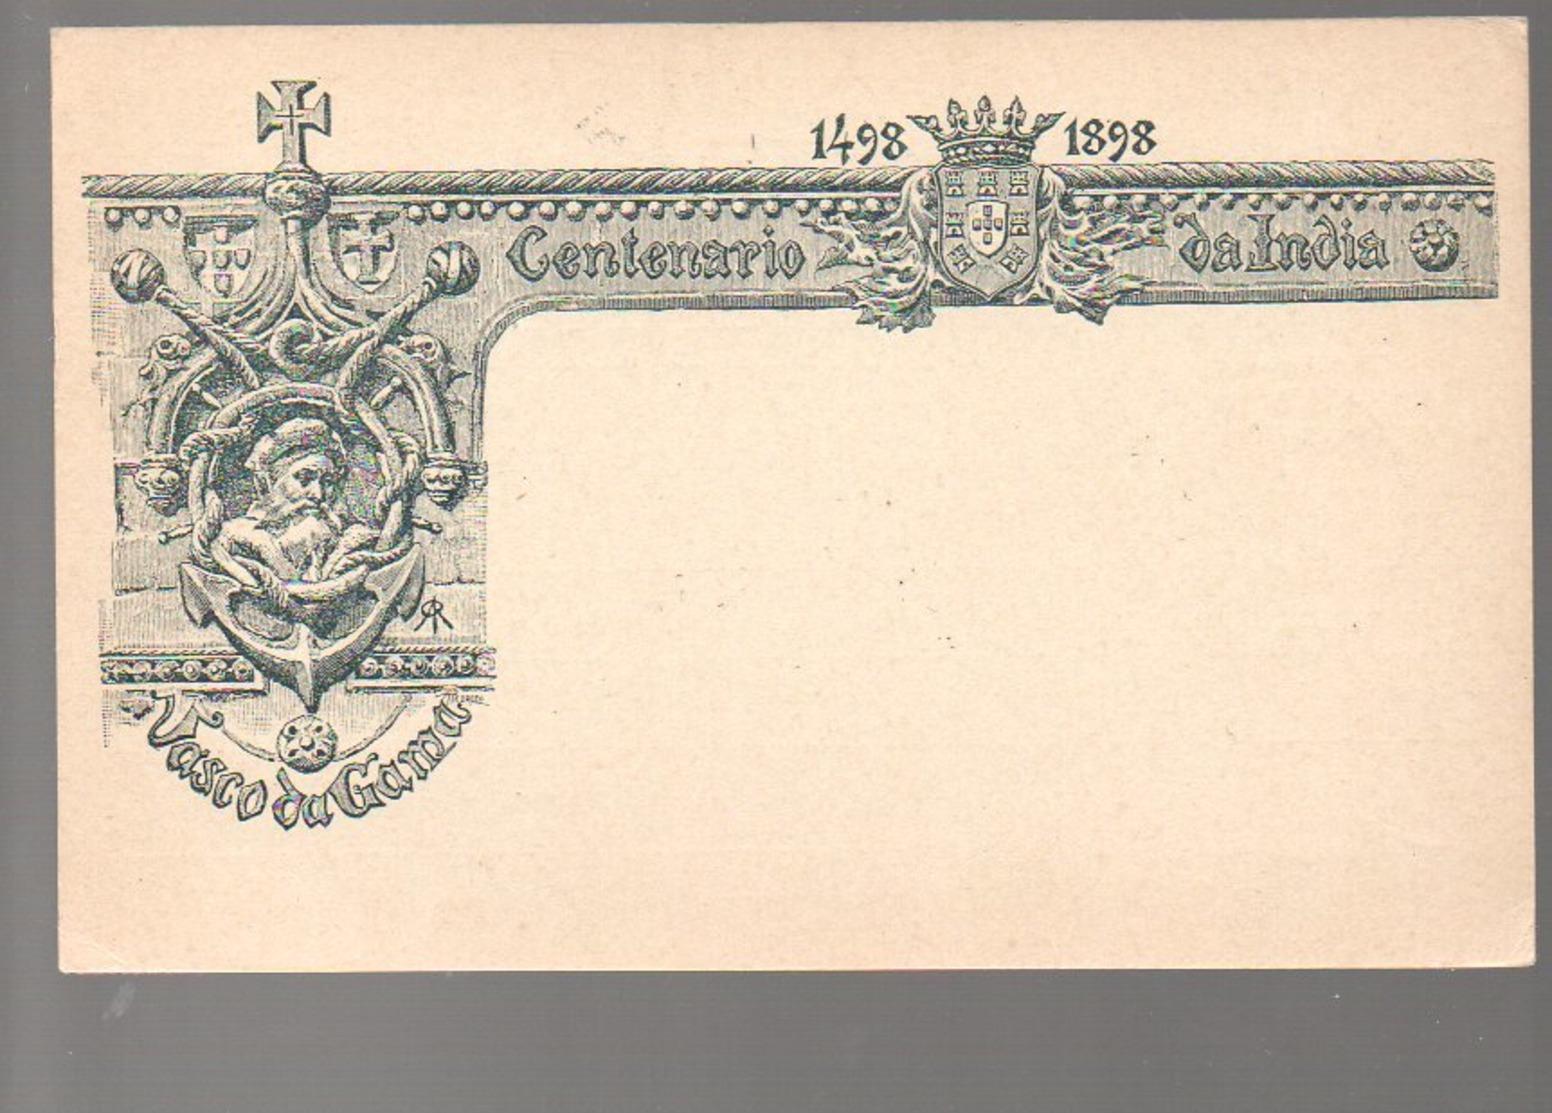 20 Reis 1898 > Hermann Meyer Dömitz An Der Elbe (171) - Madeira